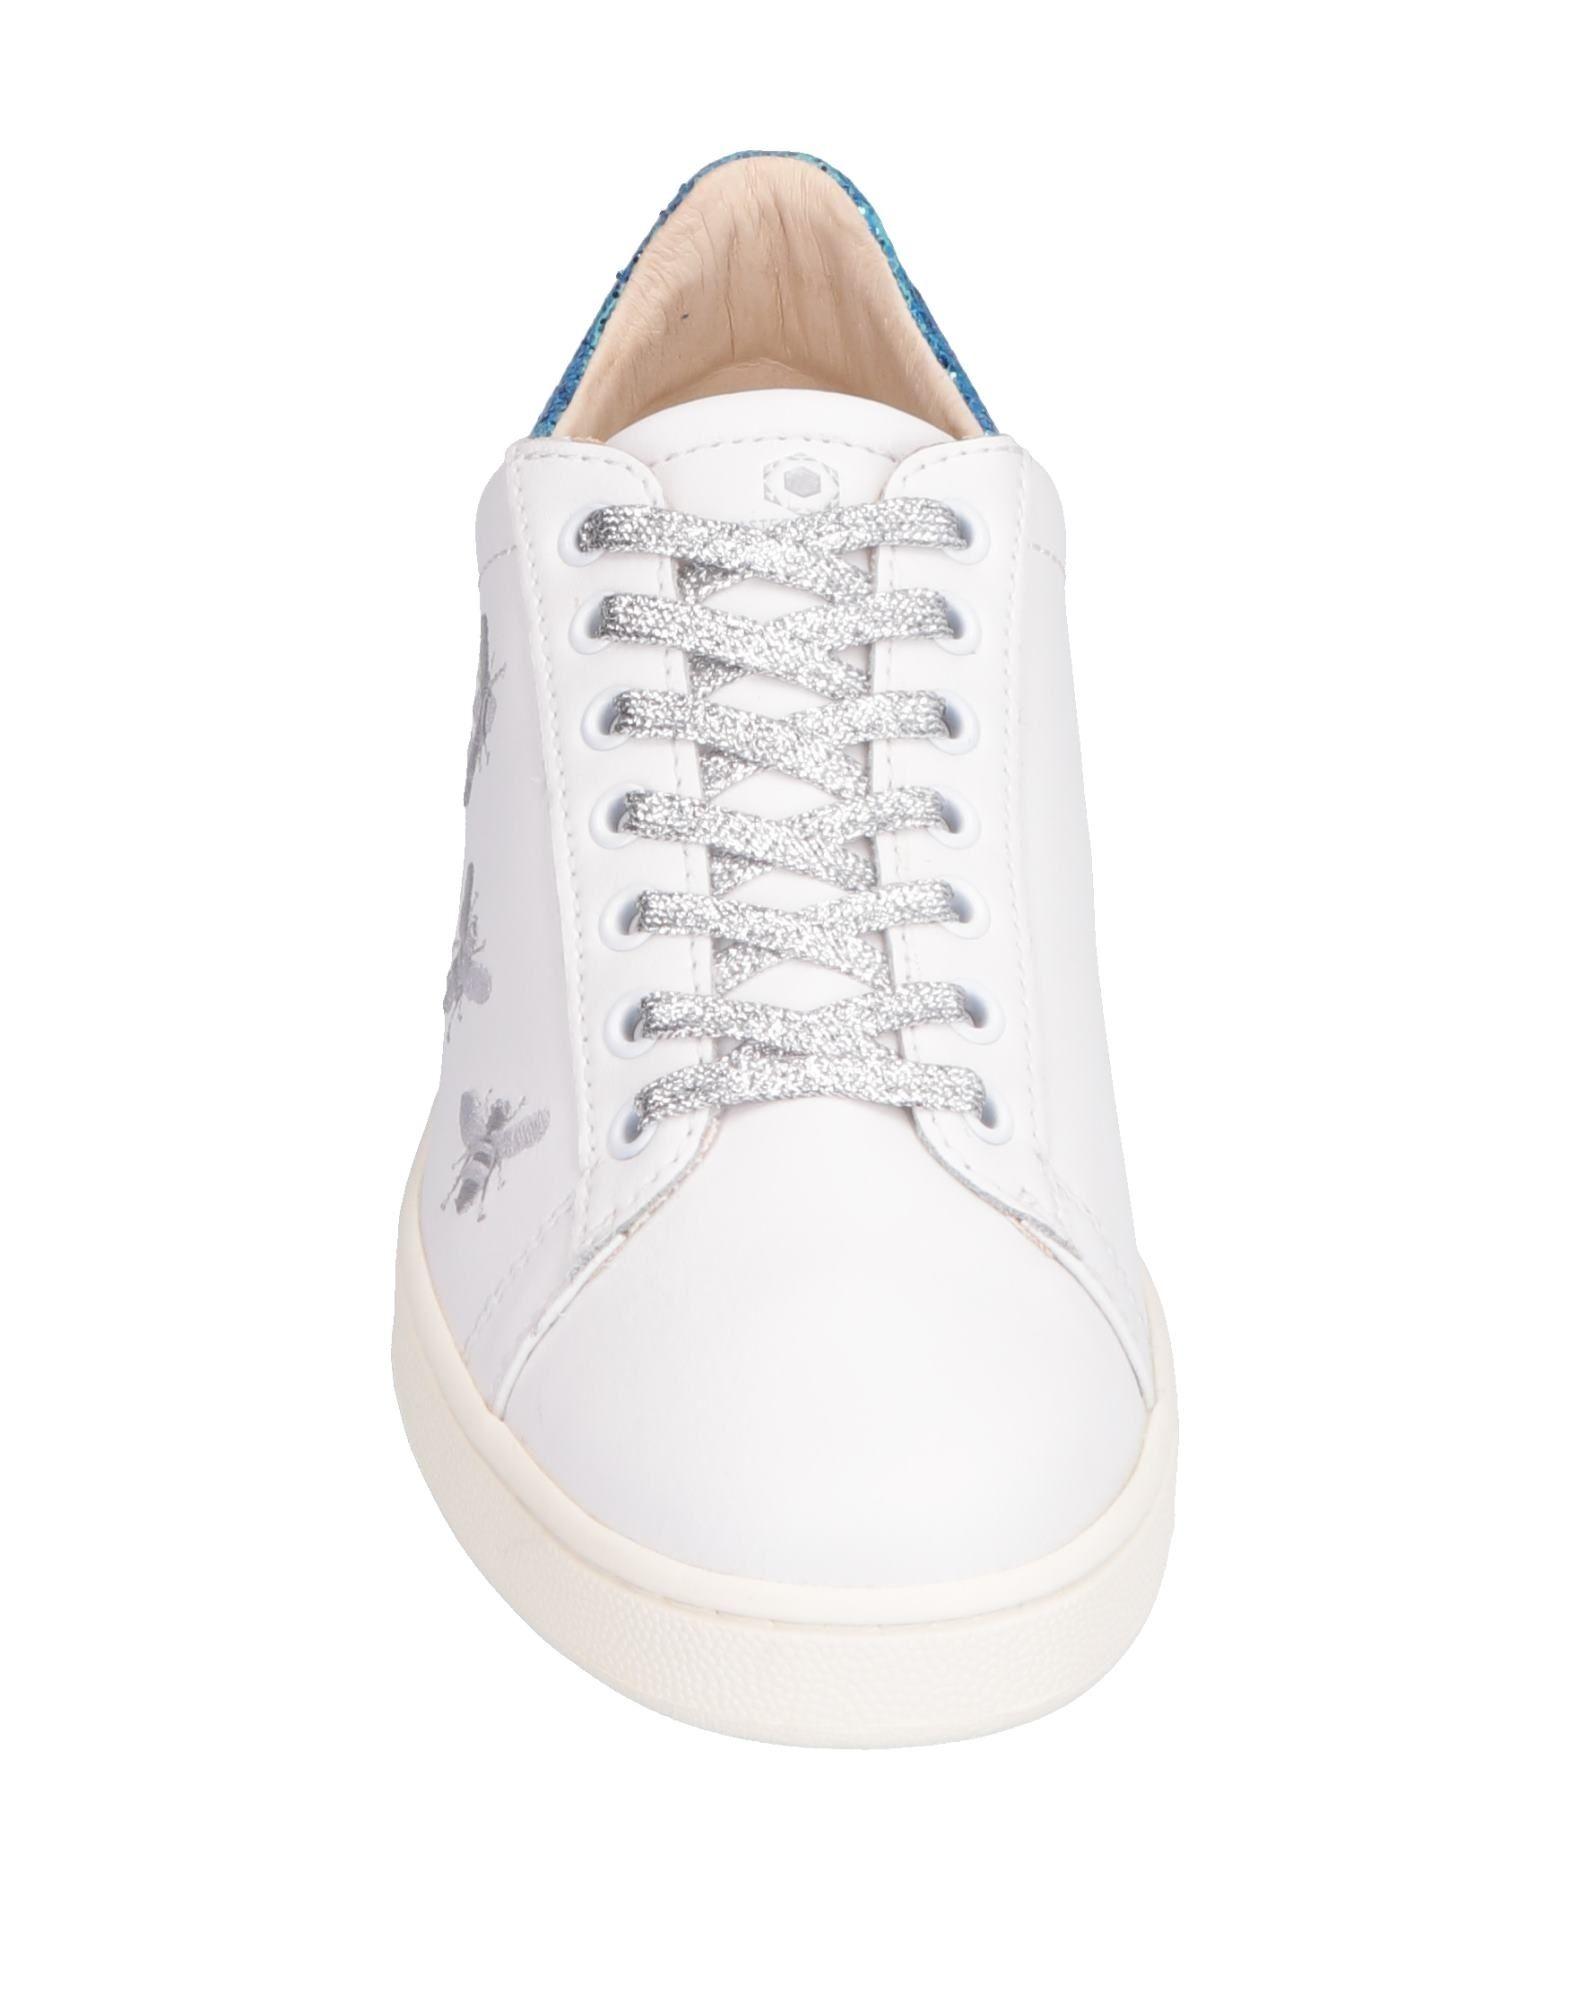 Stilvolle billige Schuhe Damen Moa Master Of Arts Sneakers Damen Schuhe  11580261QD 842b4f